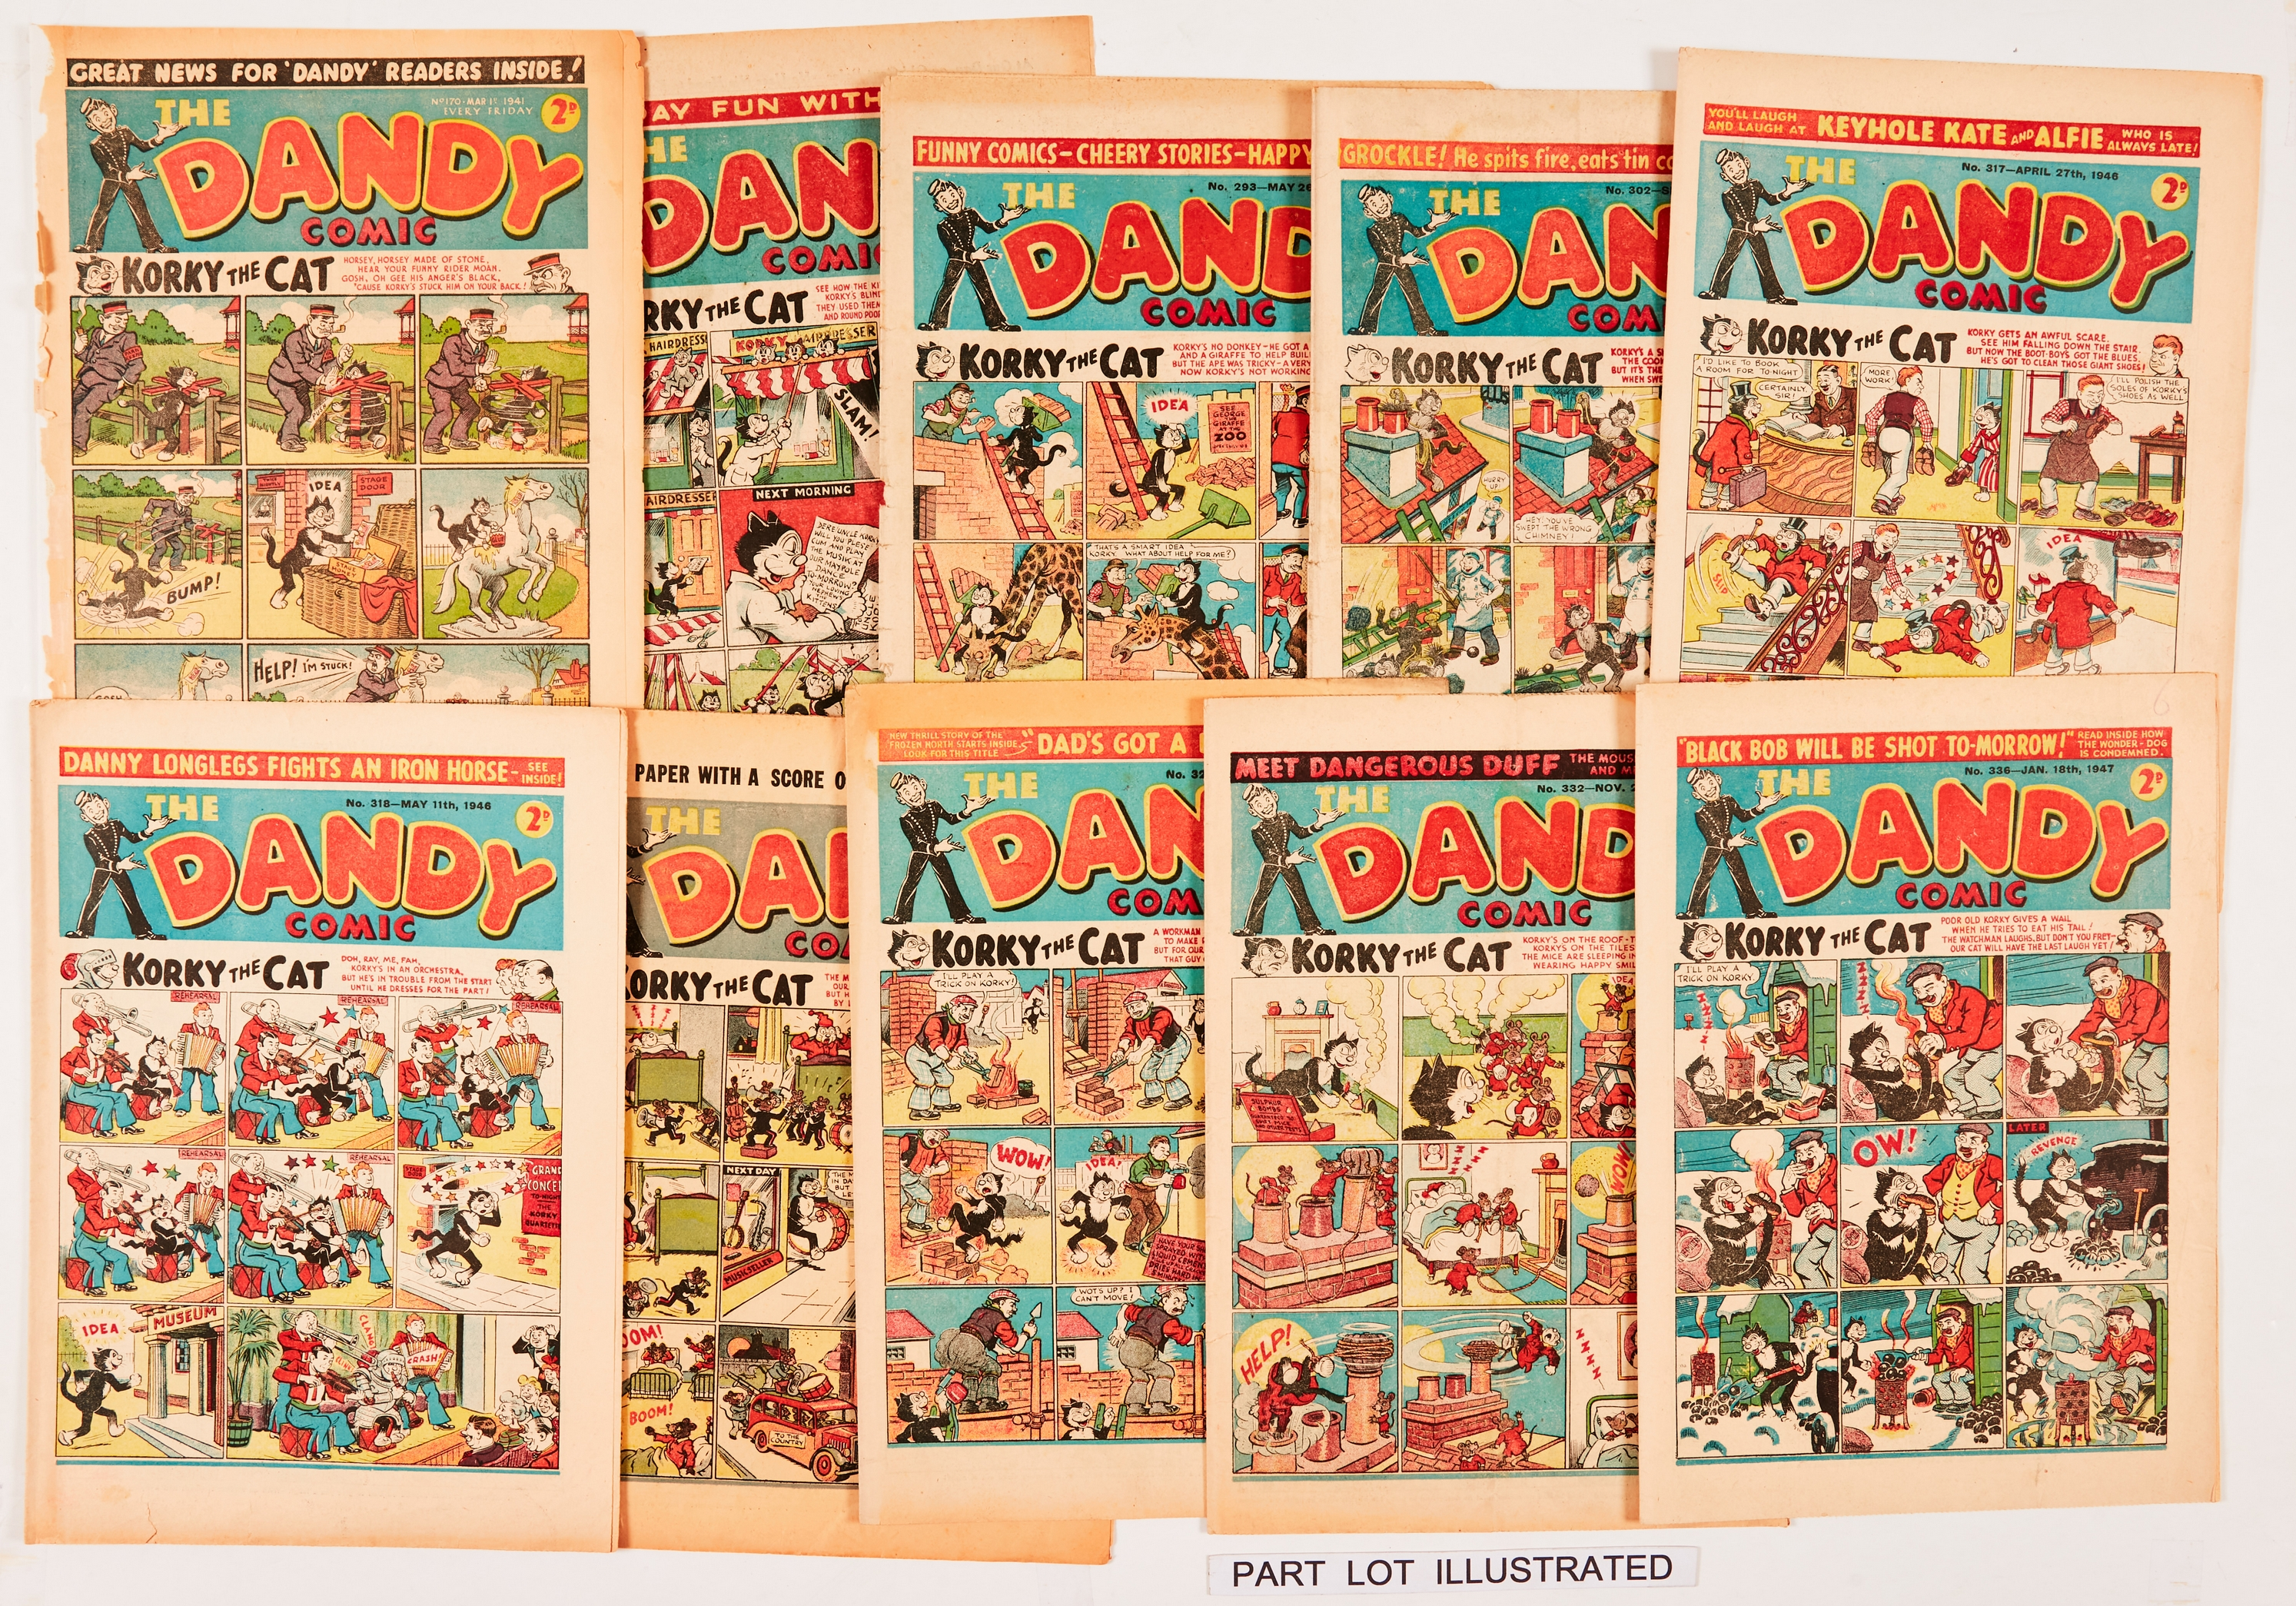 Dandy (1941-49) 170 [pr], 239, 293, 294, 302, 317, 318, 321, 324, 332, 336, 377, 411 [gd/vg] (12).